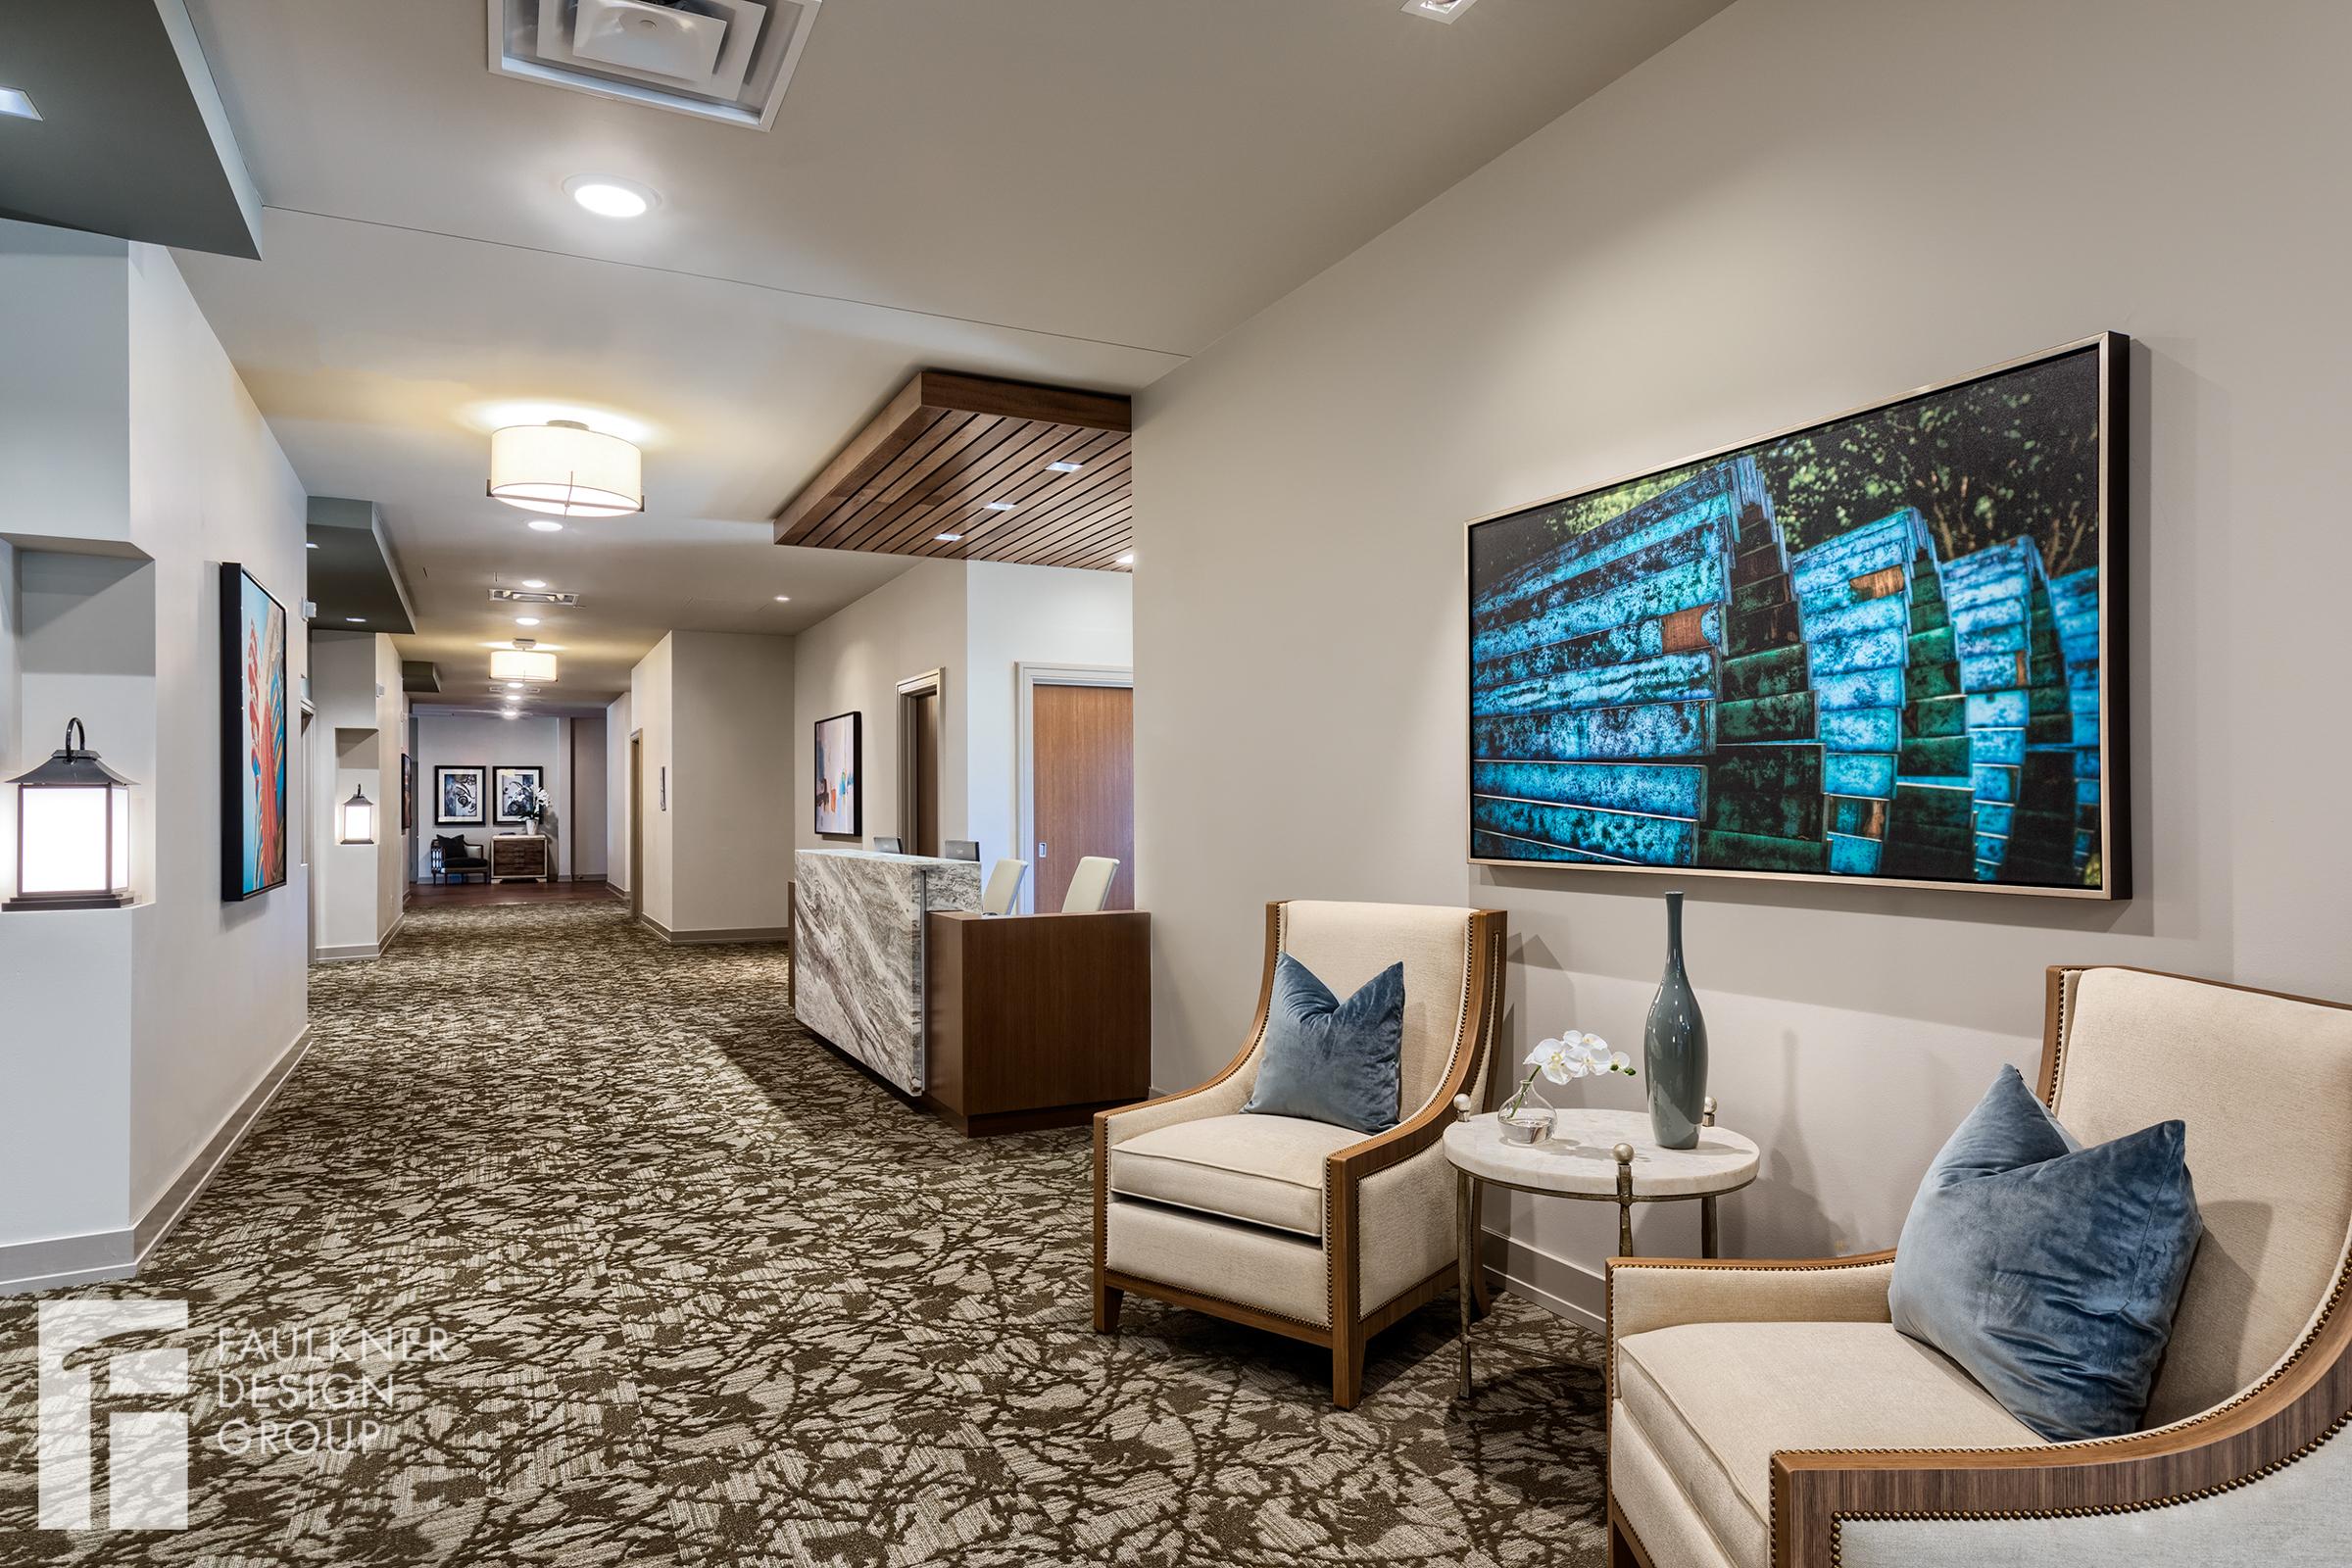 T. Boone Pickens Hospice and Palliative Care Center